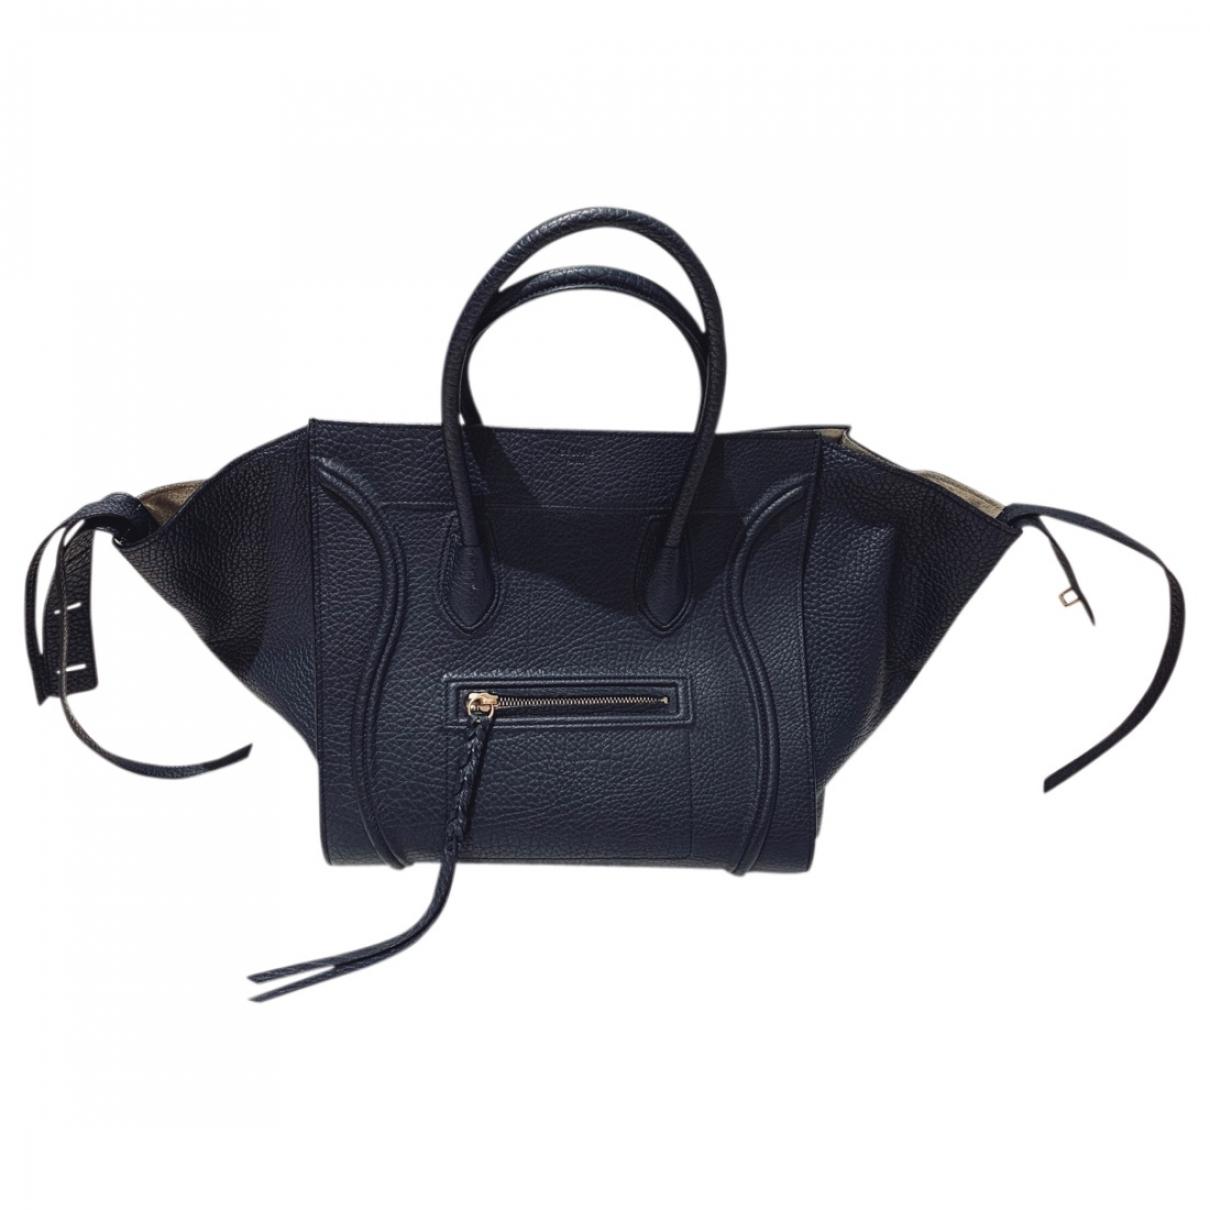 Celine Luggage Phantom Navy Leather handbag for Women \N